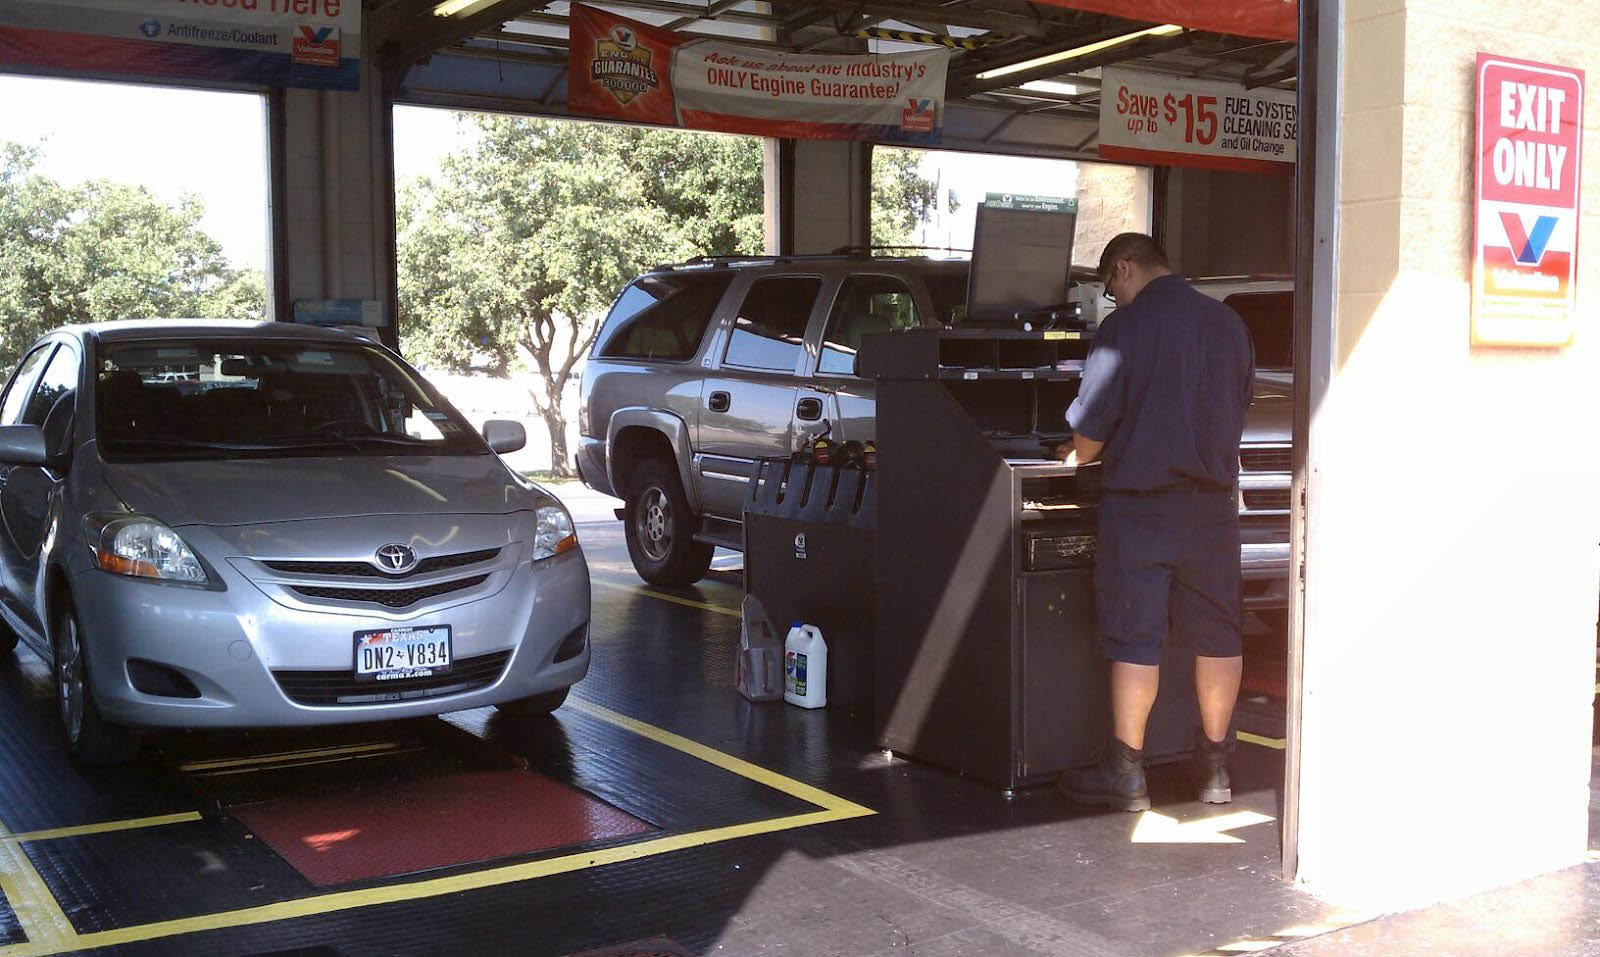 Valvoline-Instant-Oil-Change-San-Antonio-Coupon-Service-Bays